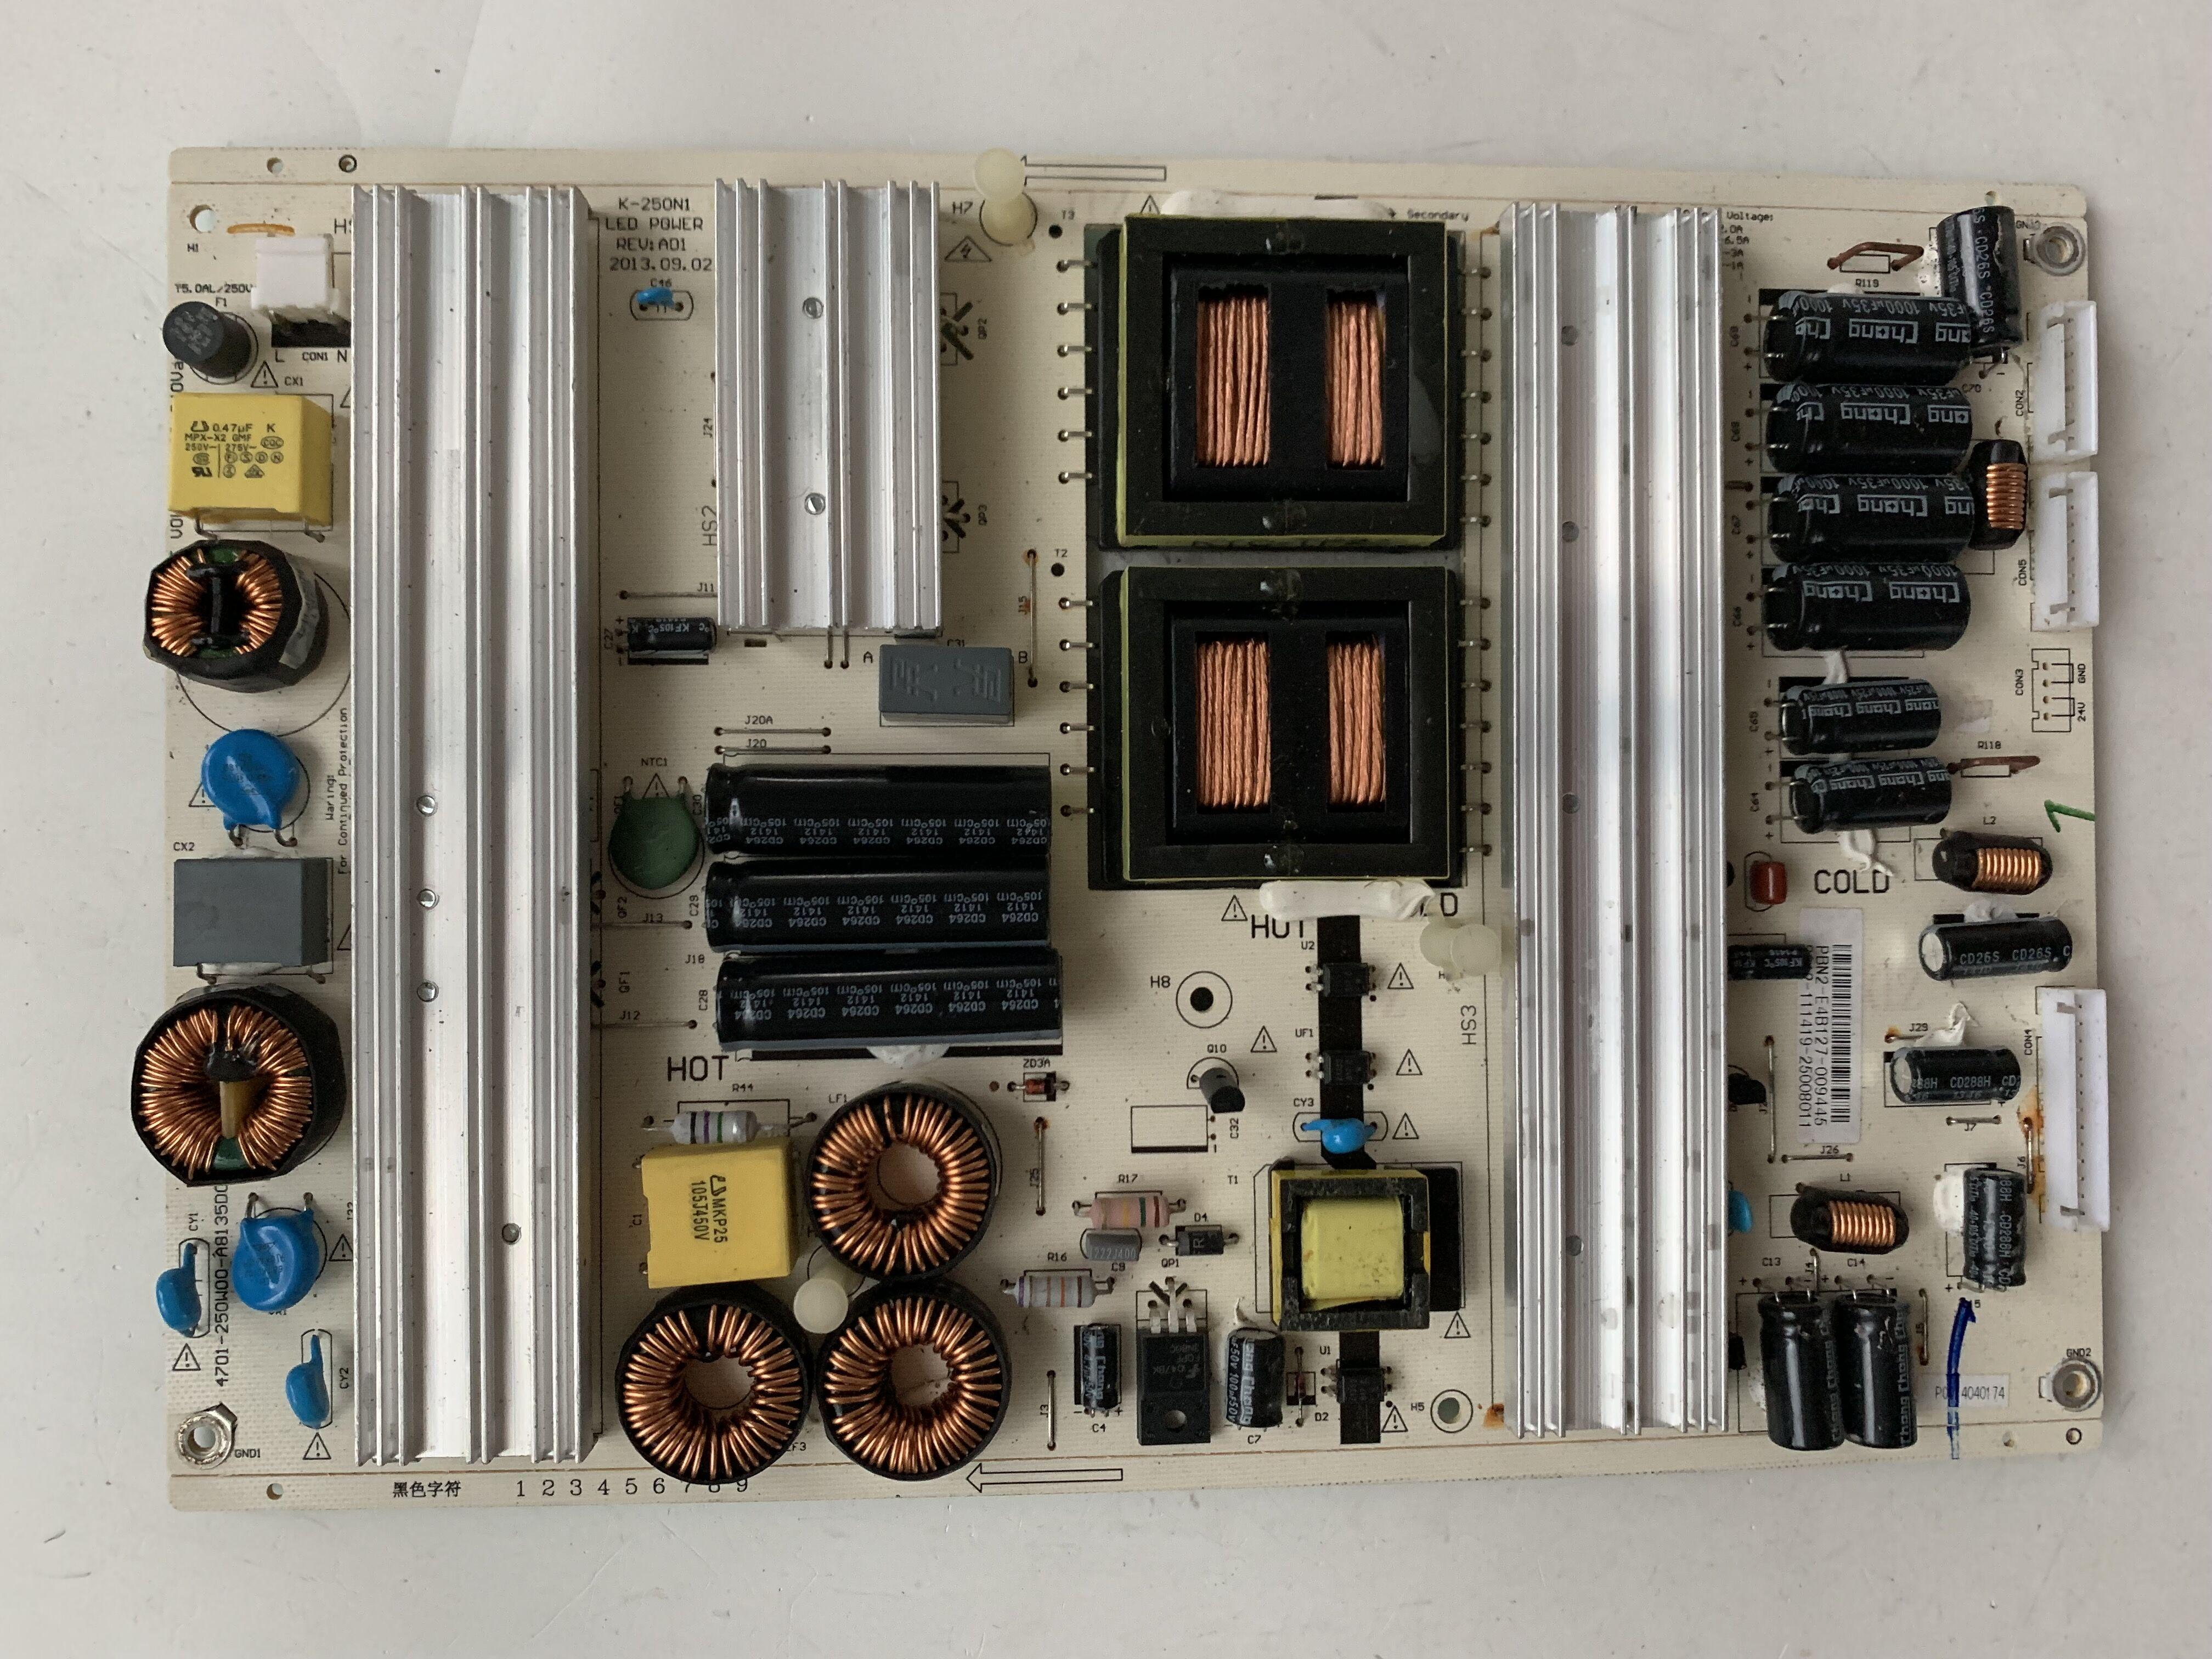 Placa base de circuito lógico Original LE55D79001 Placa de alimentación K-250N1 LED potencia REV A01 PBN2-C90123-0